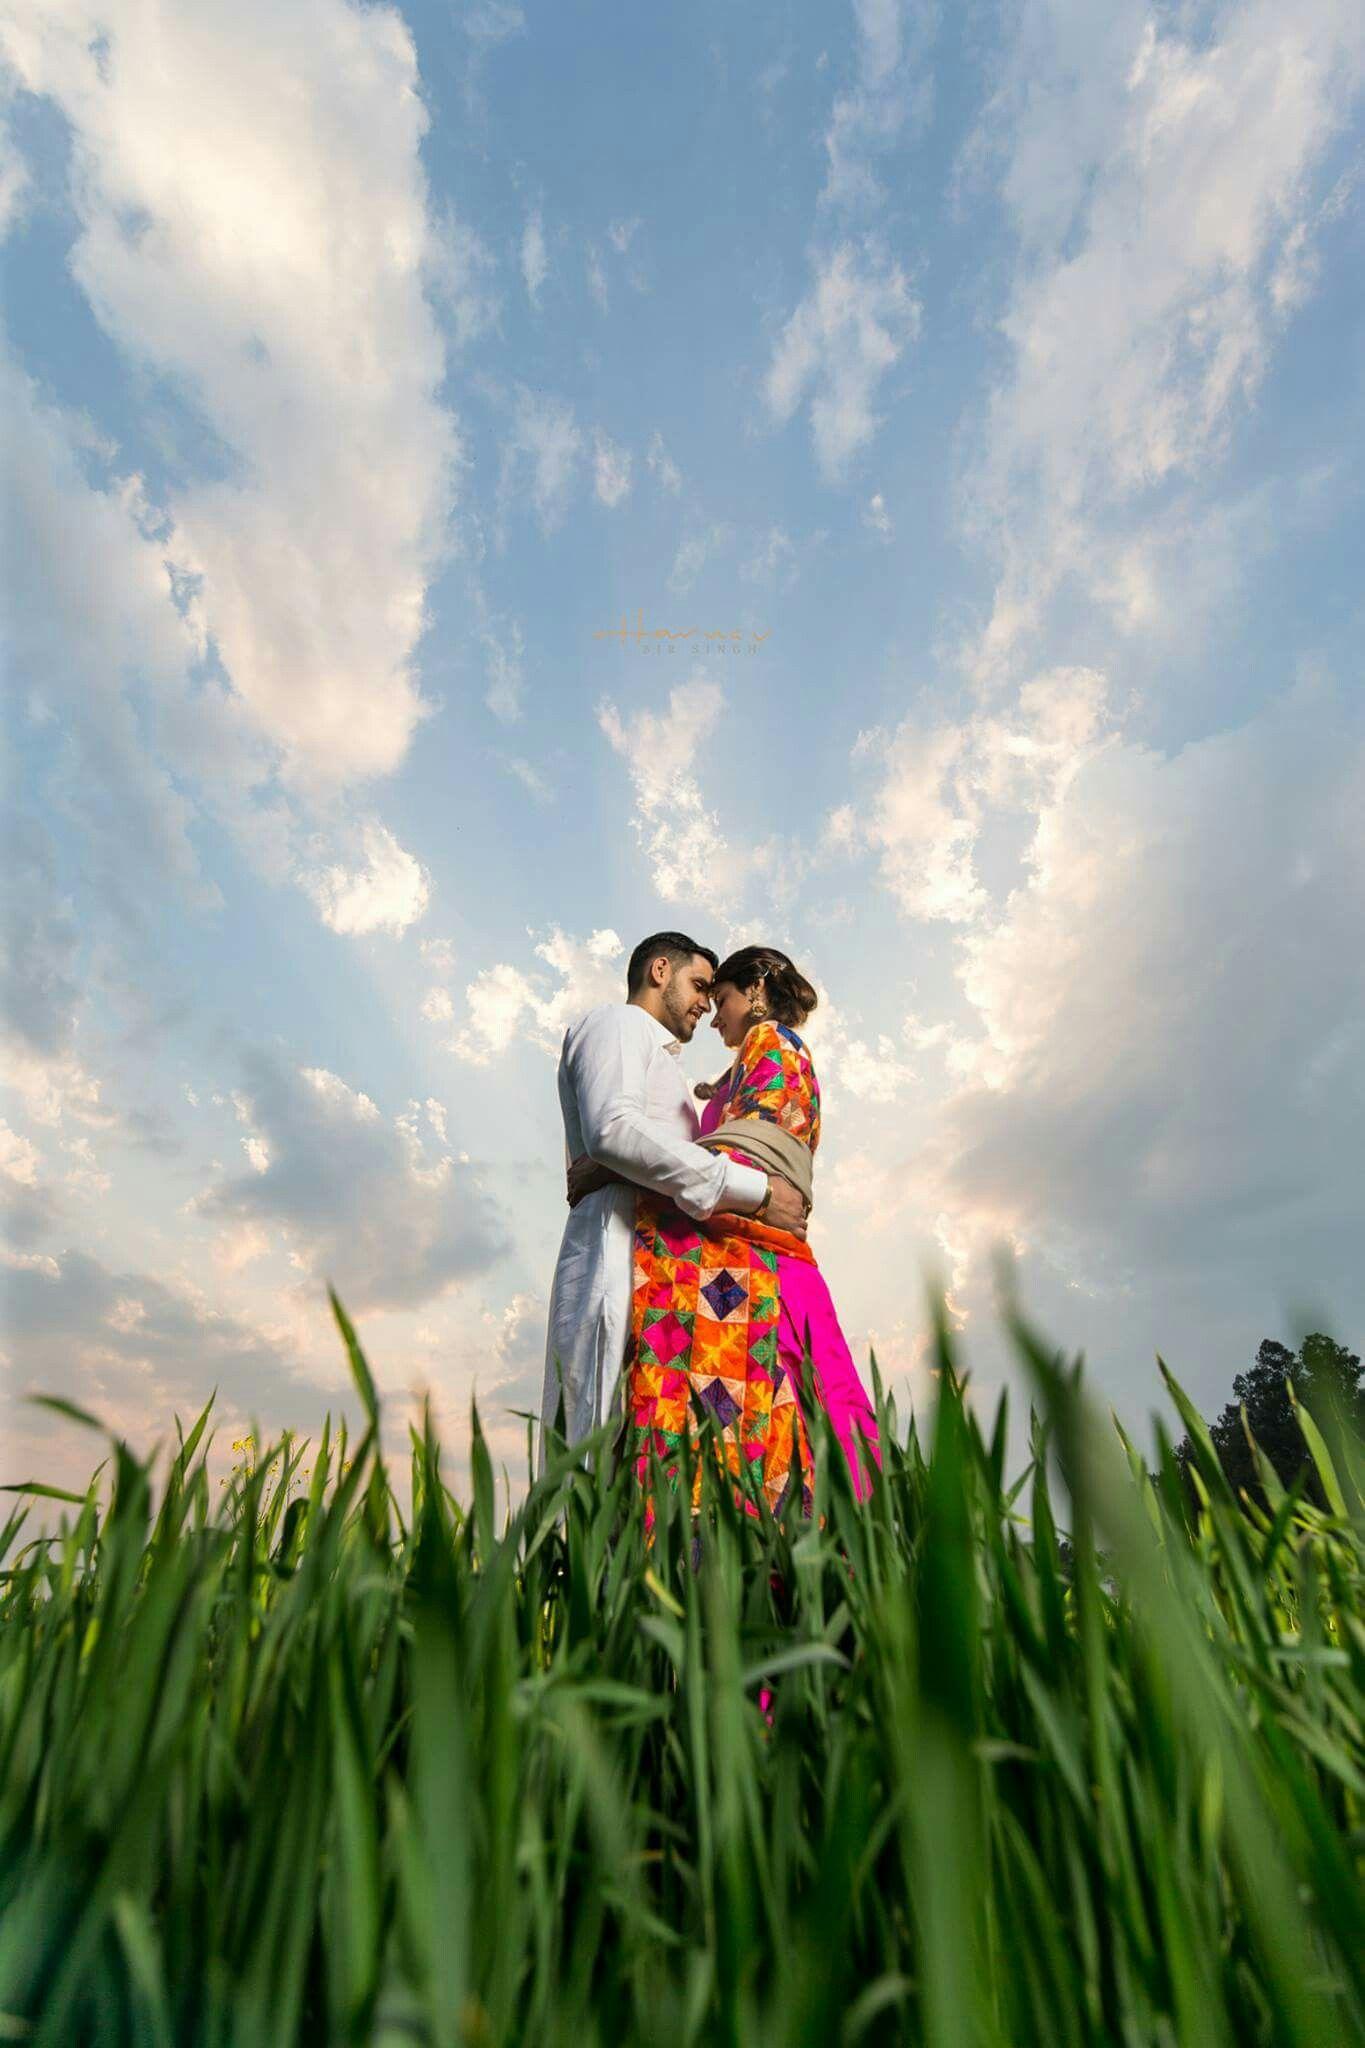 Pin by jas saini on pre wedding pose pinterest wedding wedding